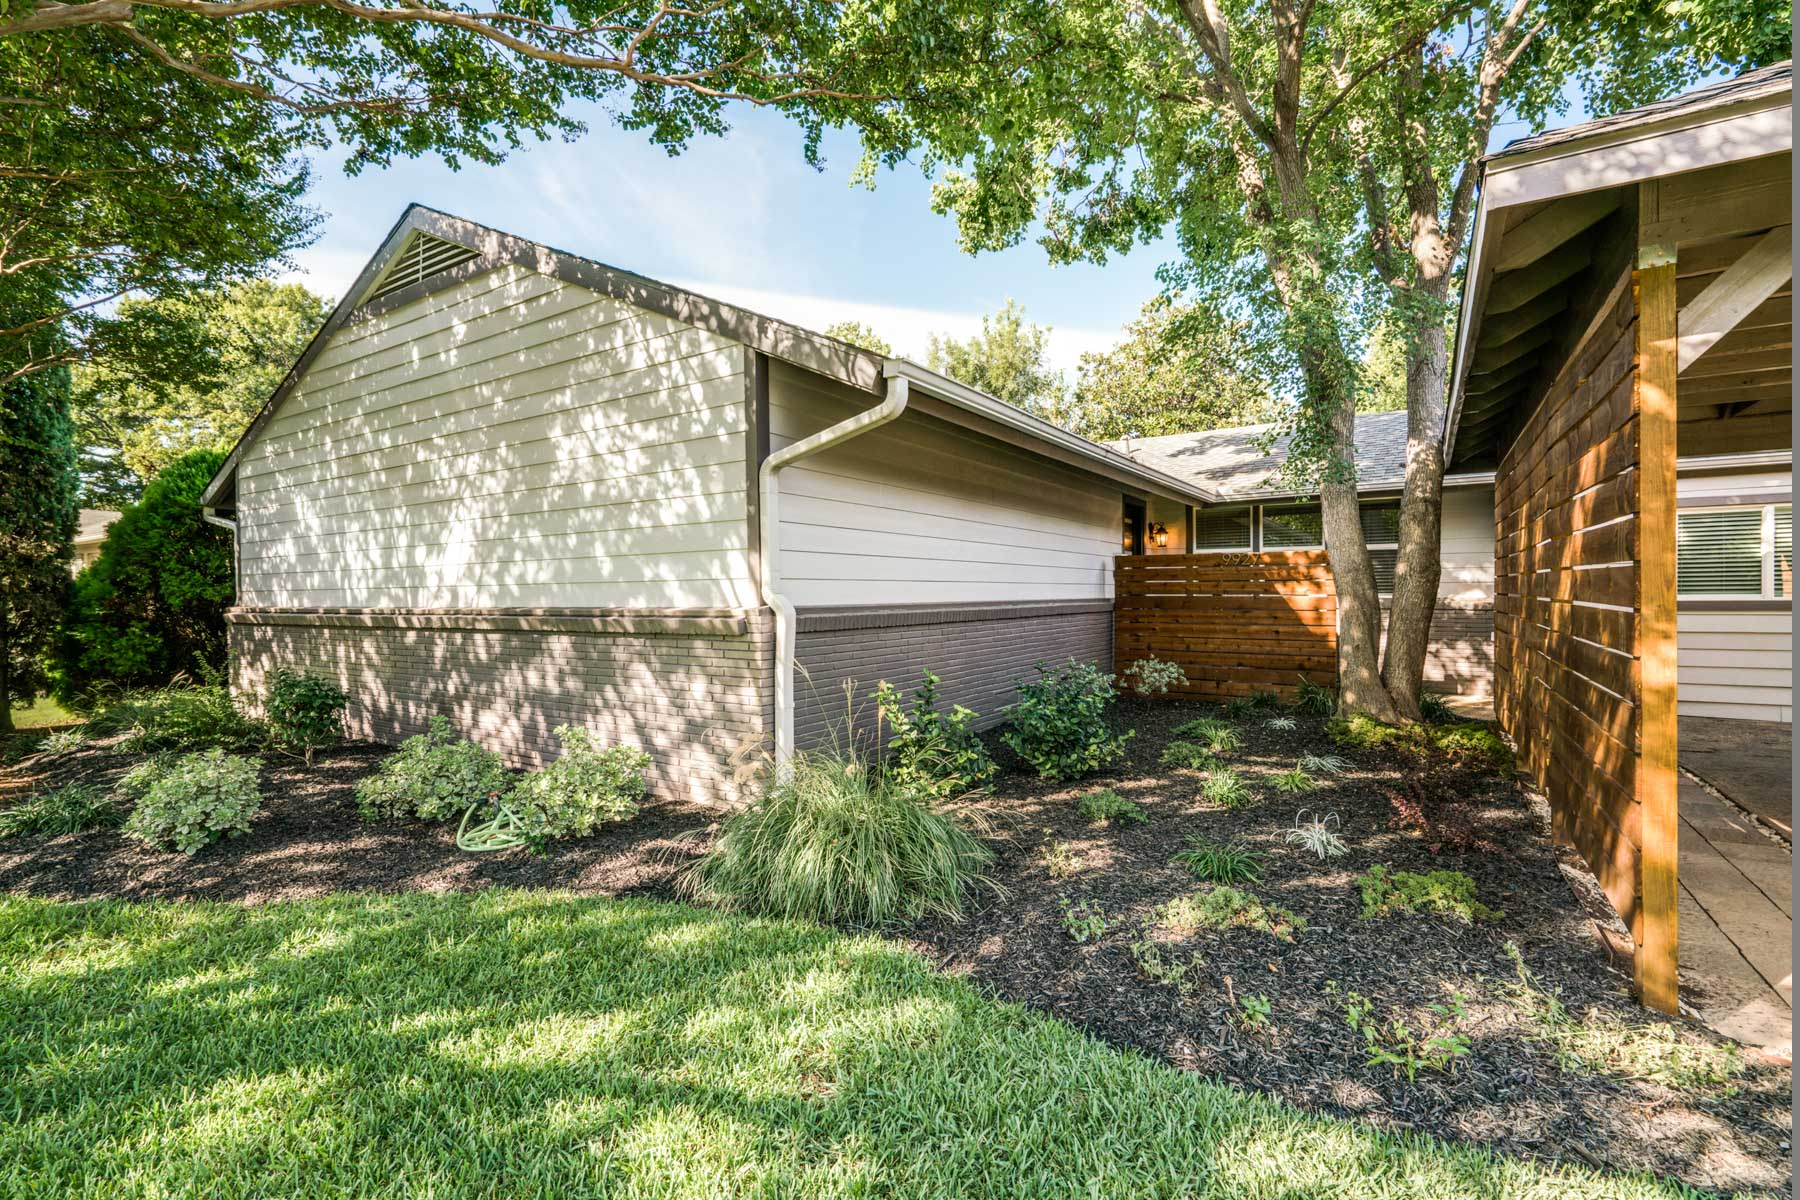 Casa para uma família para Venda às 9927 Lenel Place, Dallas Dallas, Texas, 75220 Estados Unidos